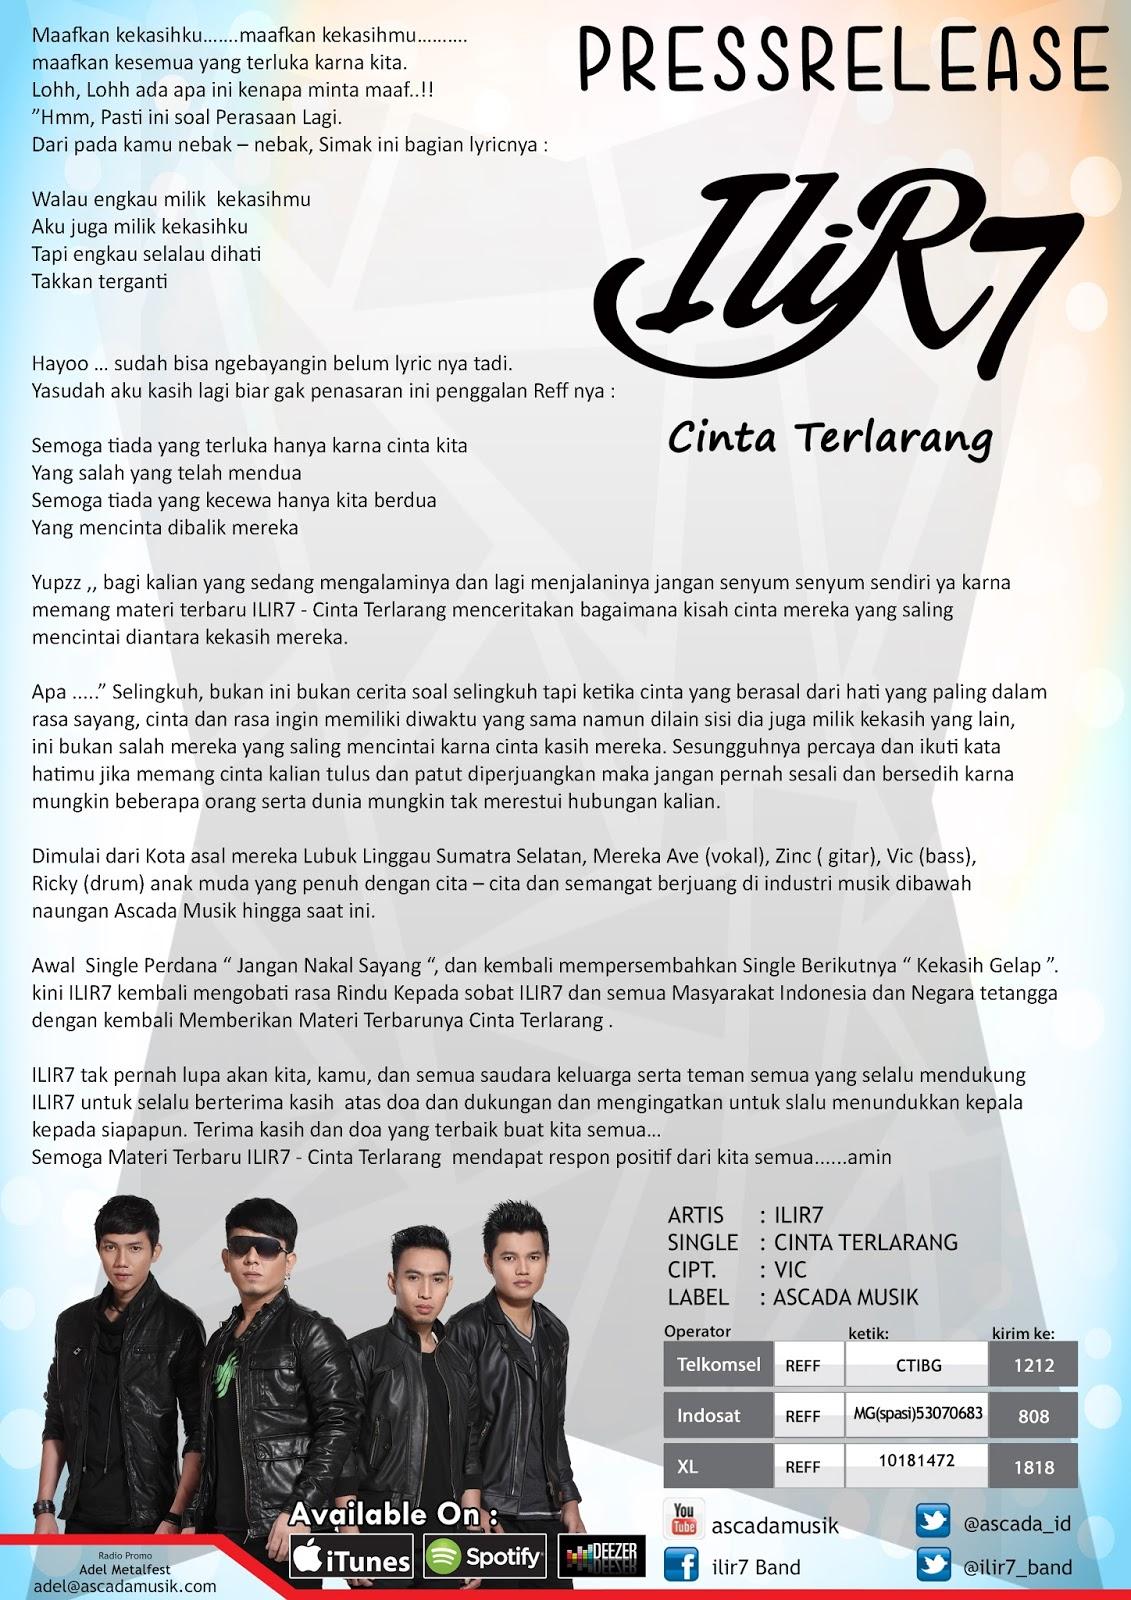 Cinta Terlarang Single Terbaru Ilir 7 Baturaja Radio Etnikom Network